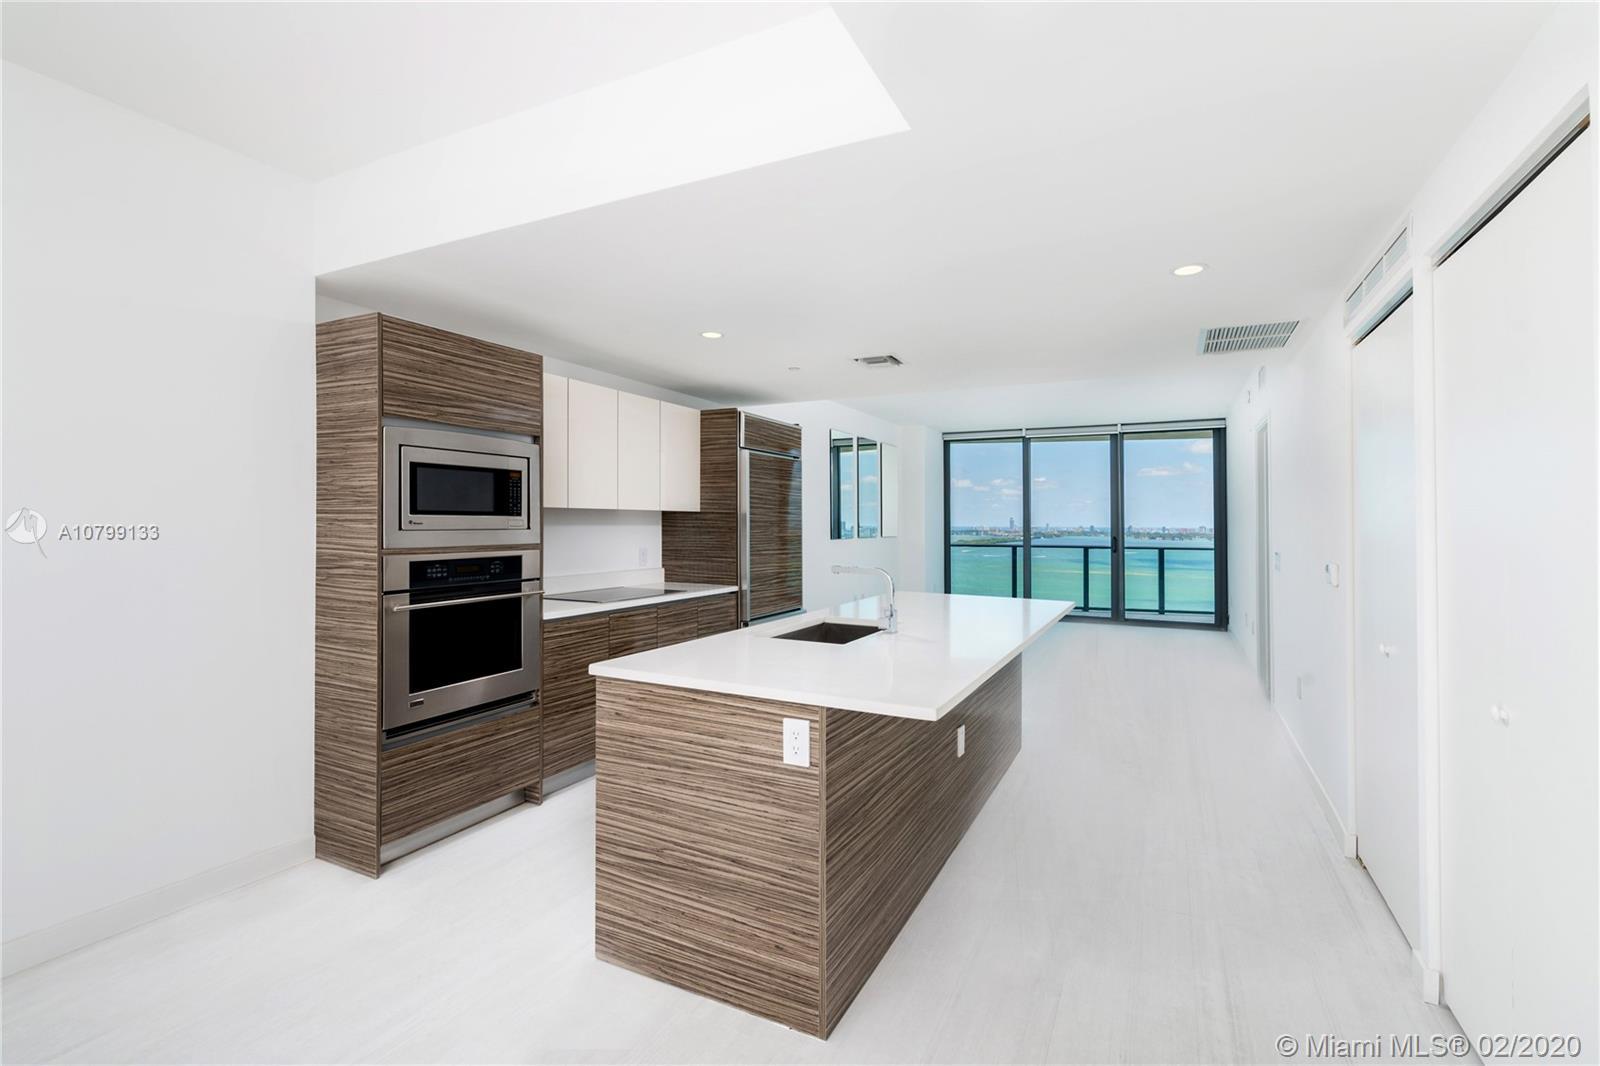 460 NE 28th St, 2704 - Miami, Florida